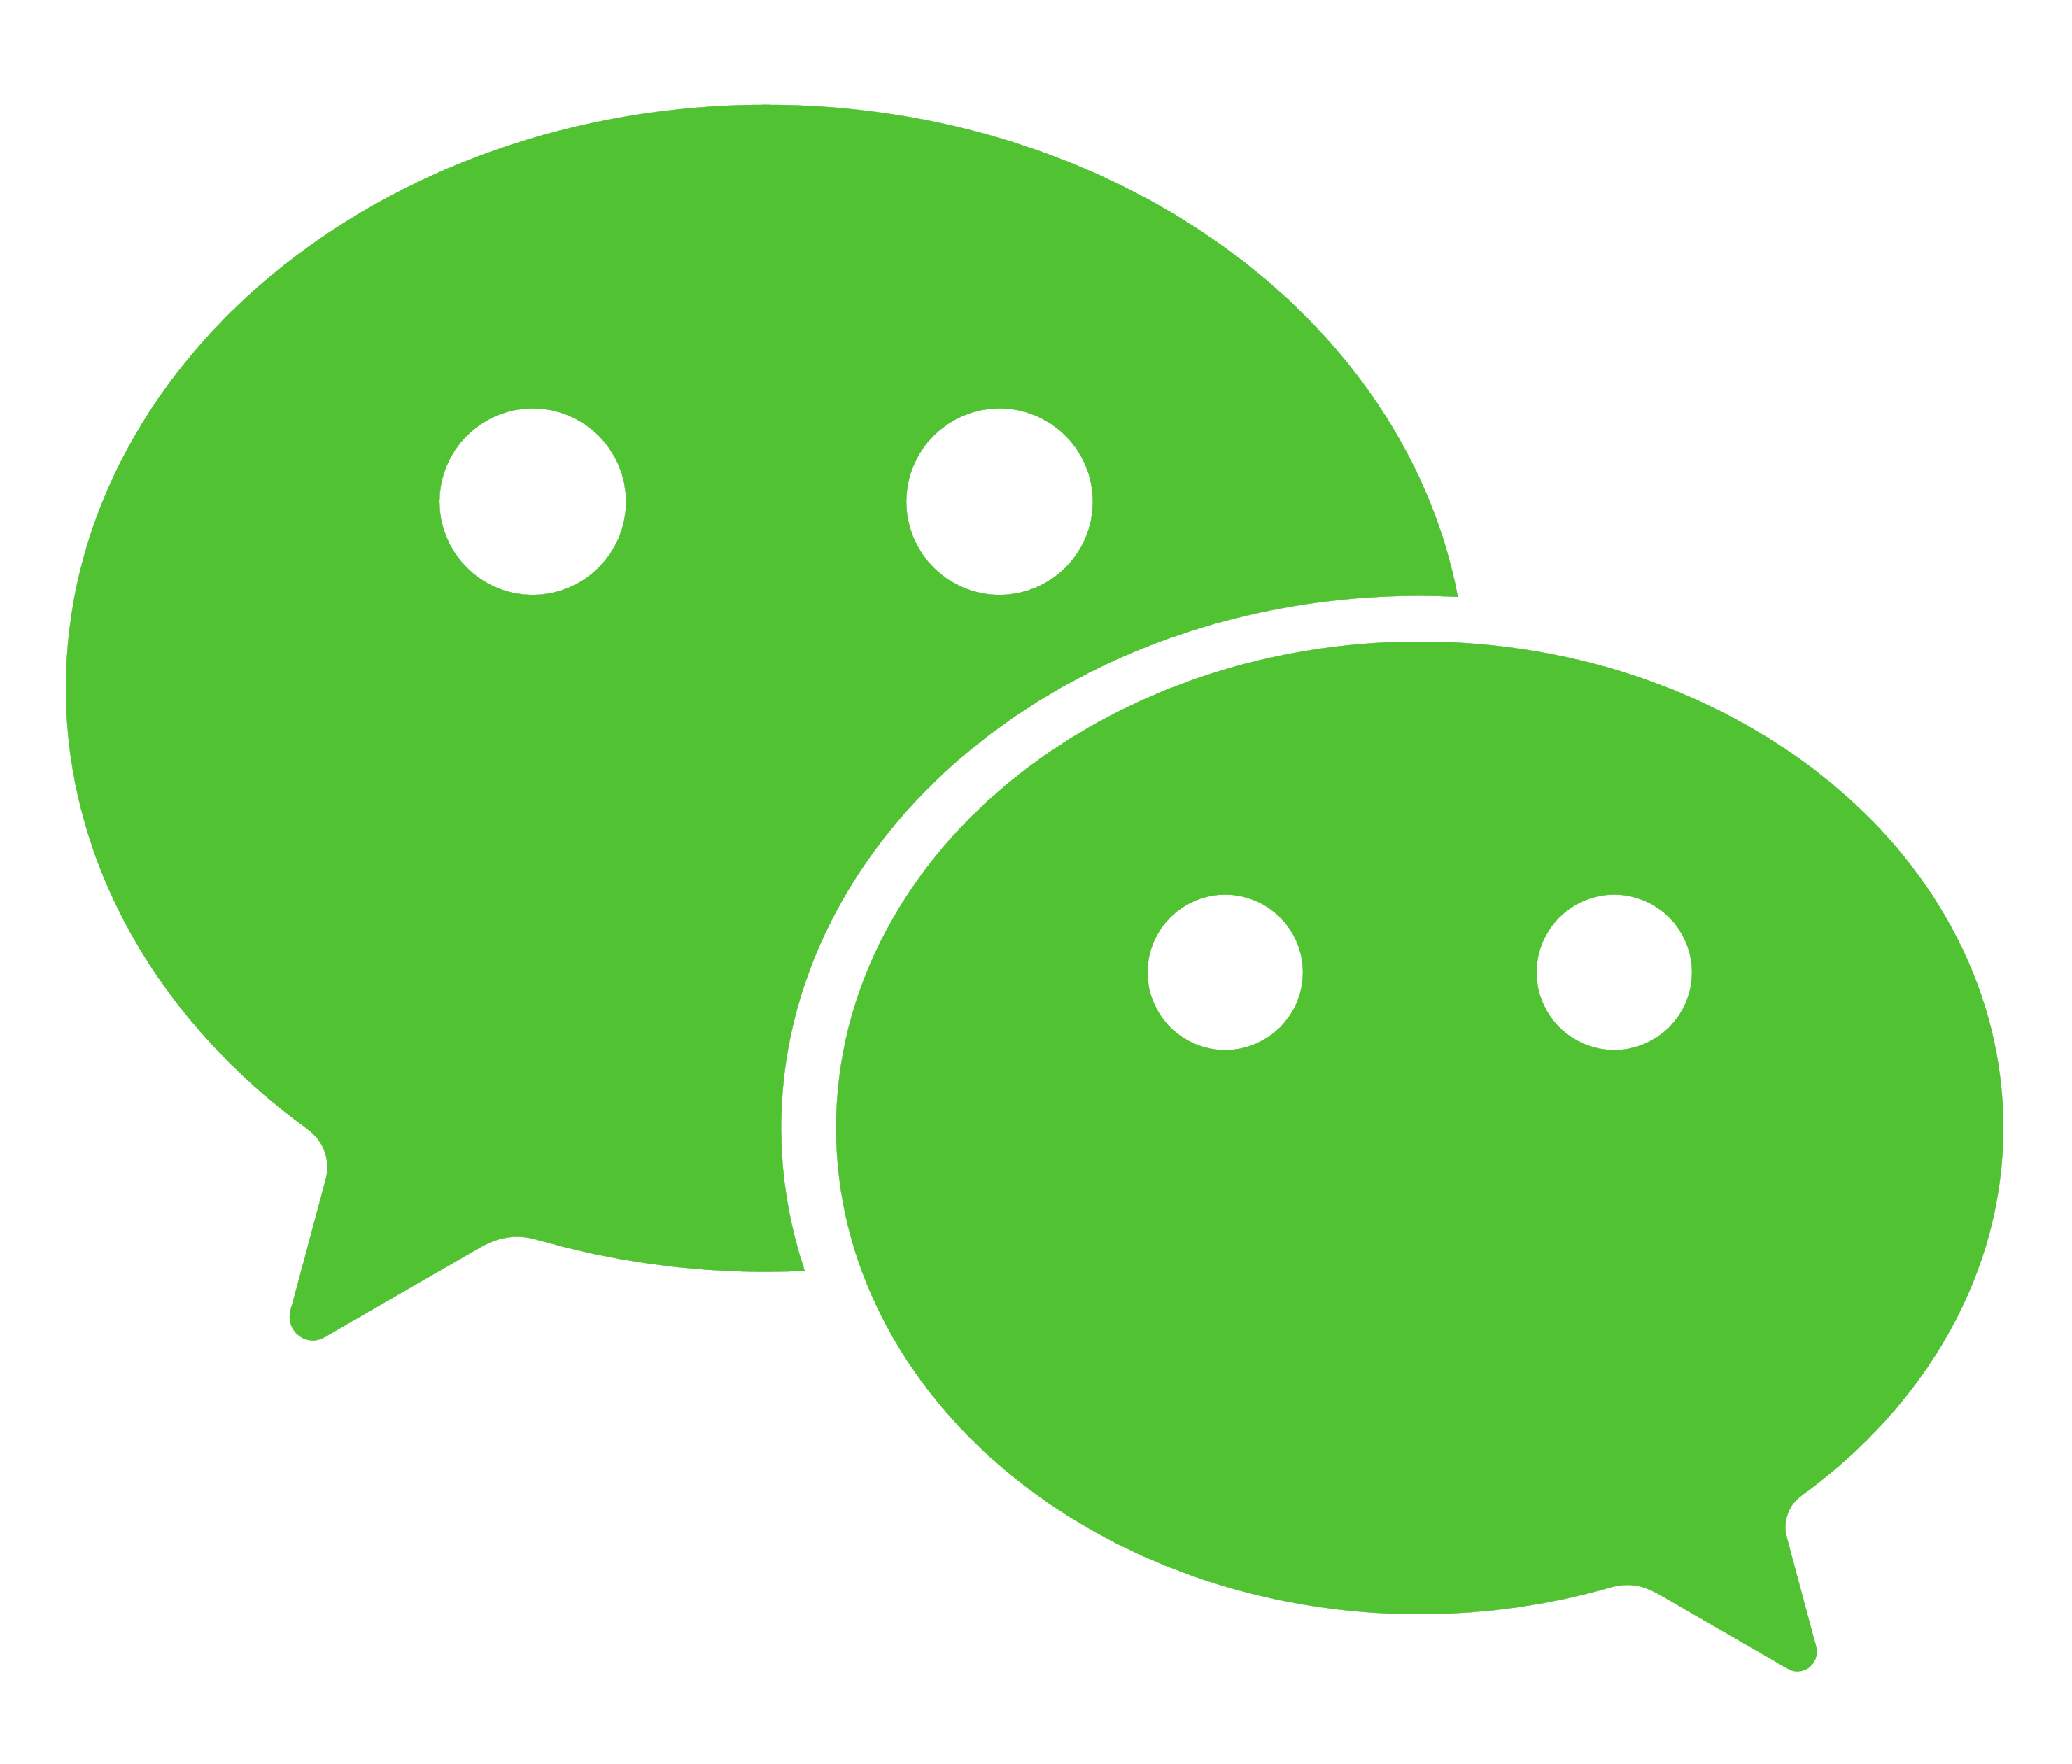 wechat logos download